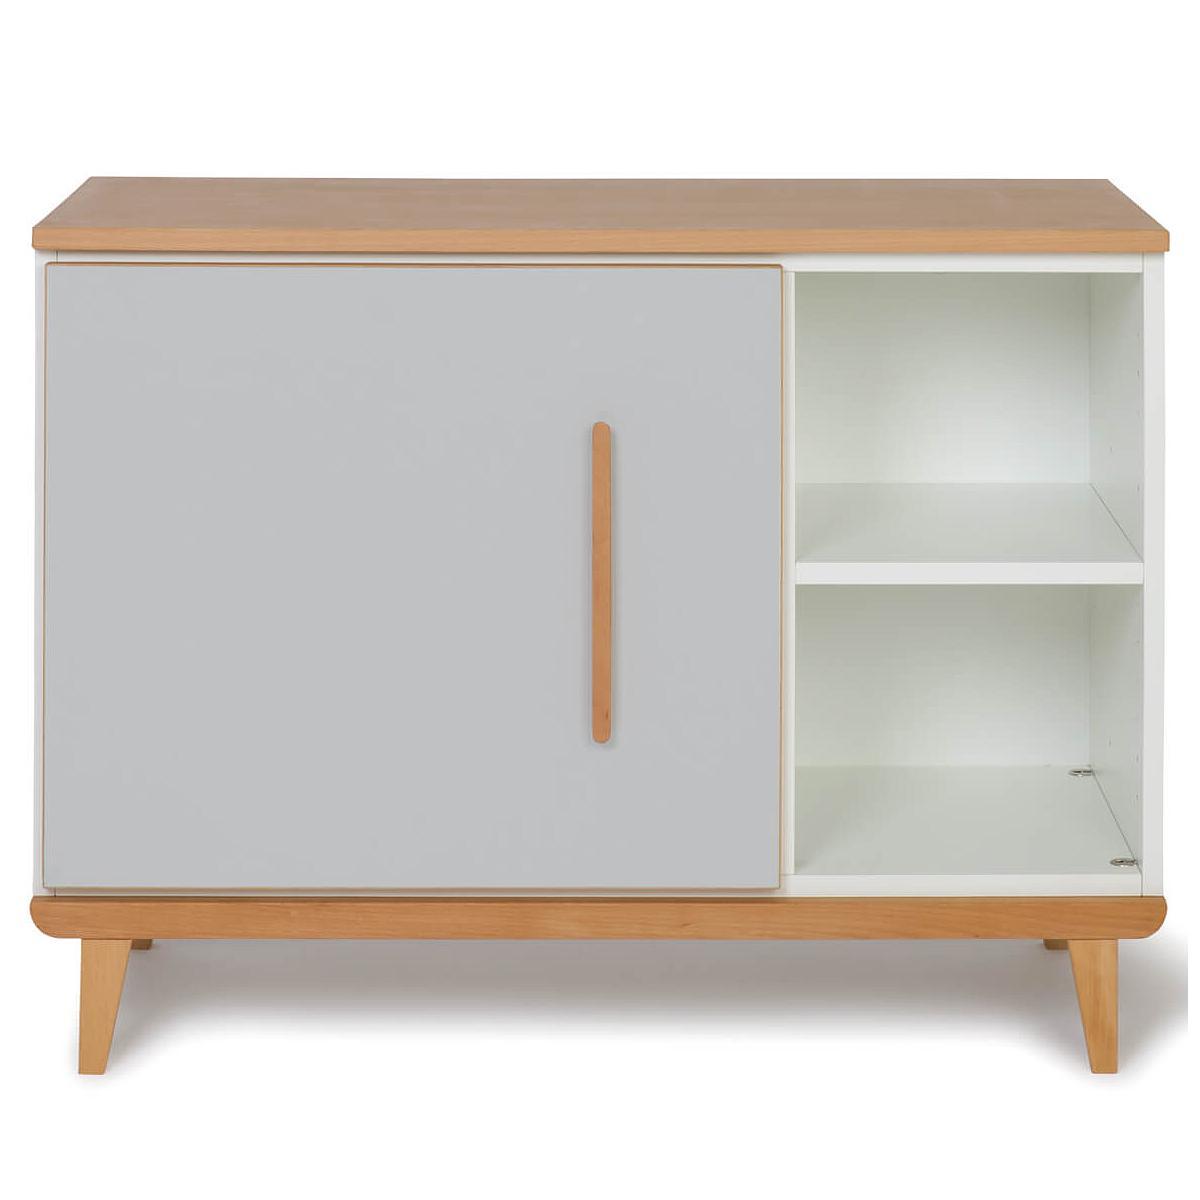 Wookids - Petit meuble 1 porte NADO grey